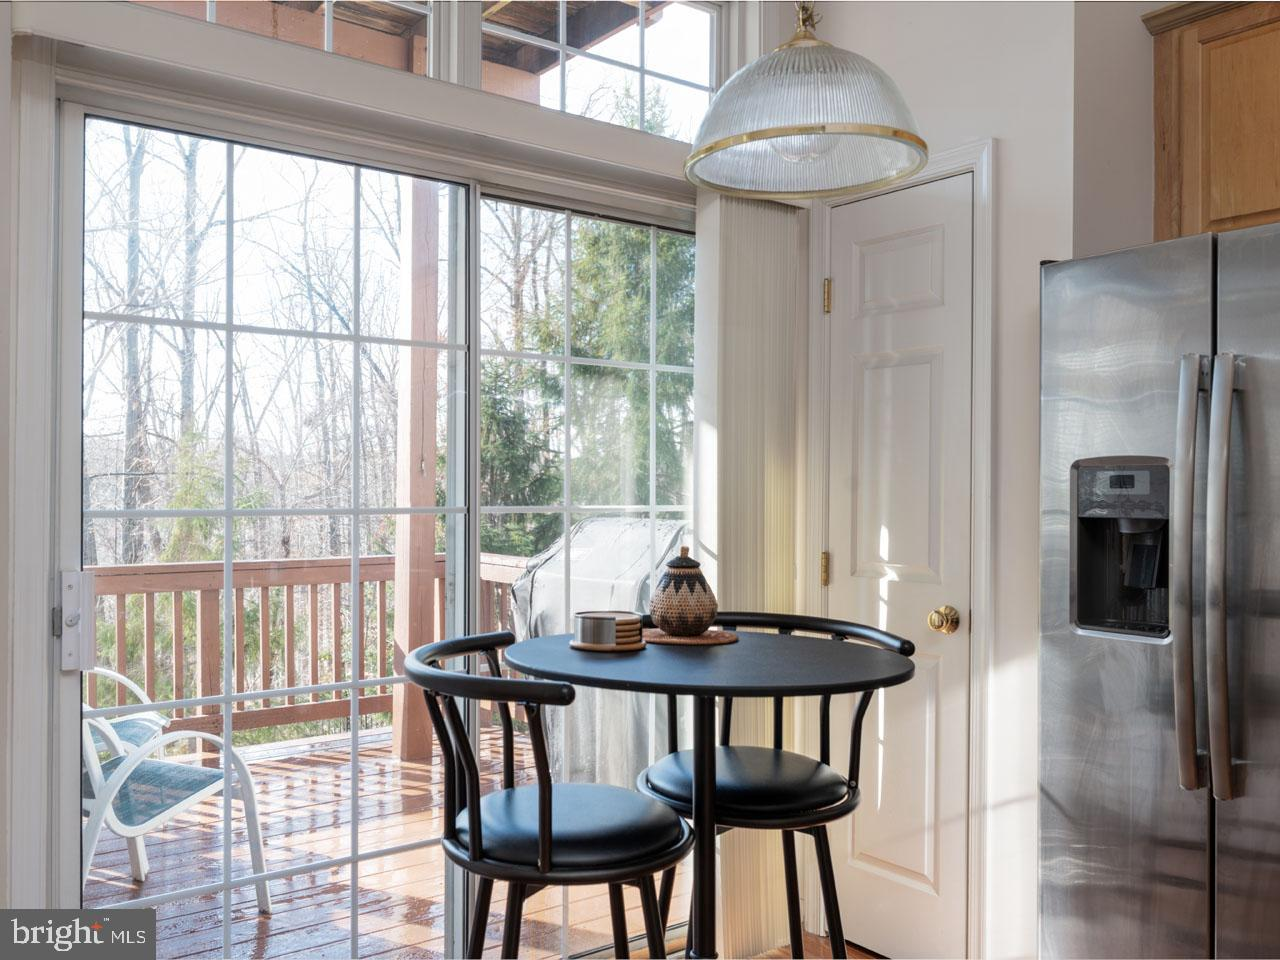 VAFX1104336-302201656763-2021-07-16-19-45-24  |   | Alexandria Delaware Real Estate For Sale | MLS# Vafx1104336  - Best of Northern Virginia